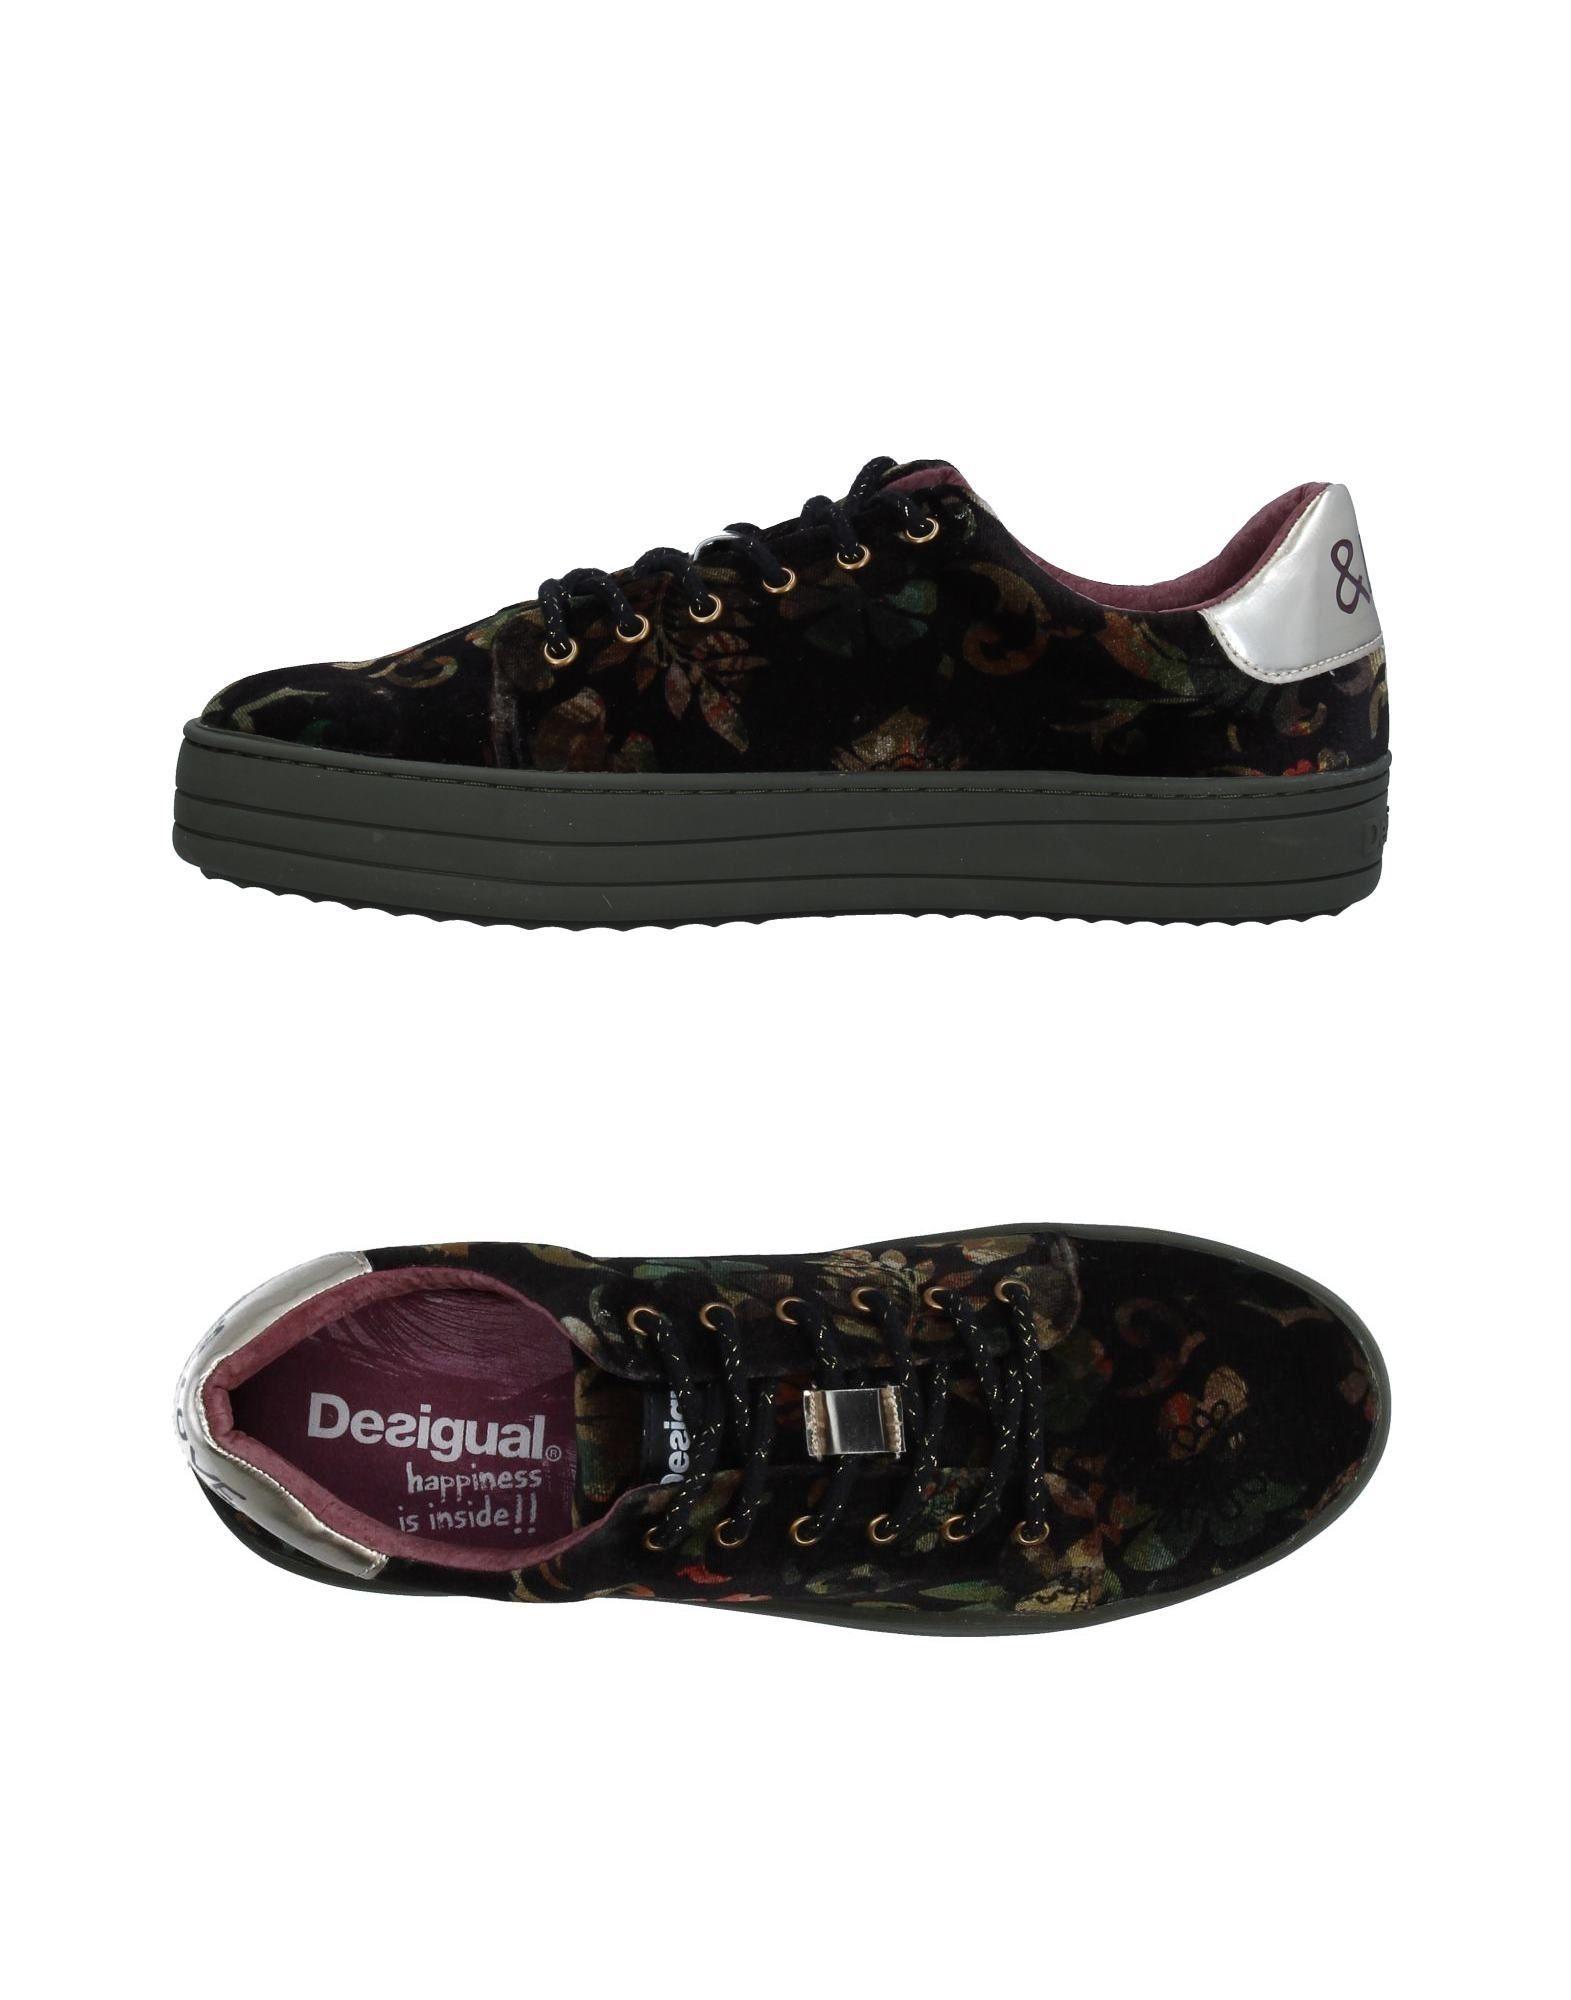 Desigual Sneakers Damen  11338161XJ Gute Qualität beliebte Schuhe